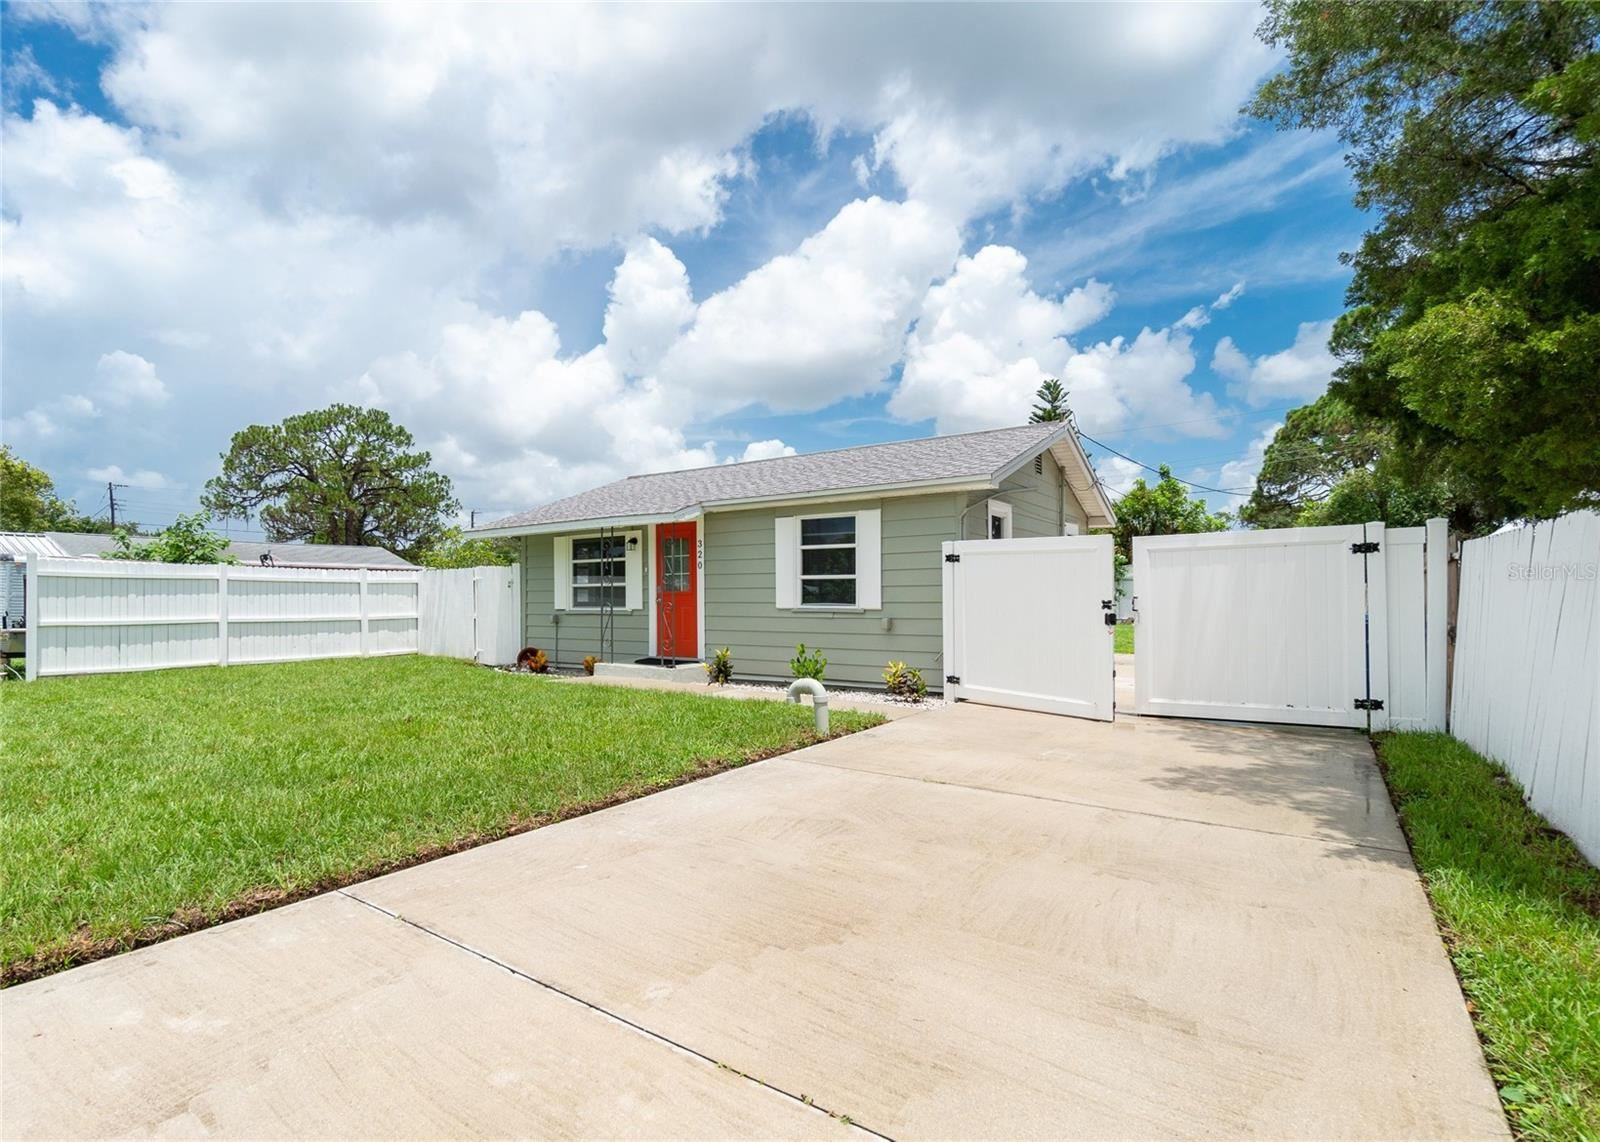 Photo of 320 E LANGSNER STREET, ENGLEWOOD, FL 34223 (MLS # A4506961)